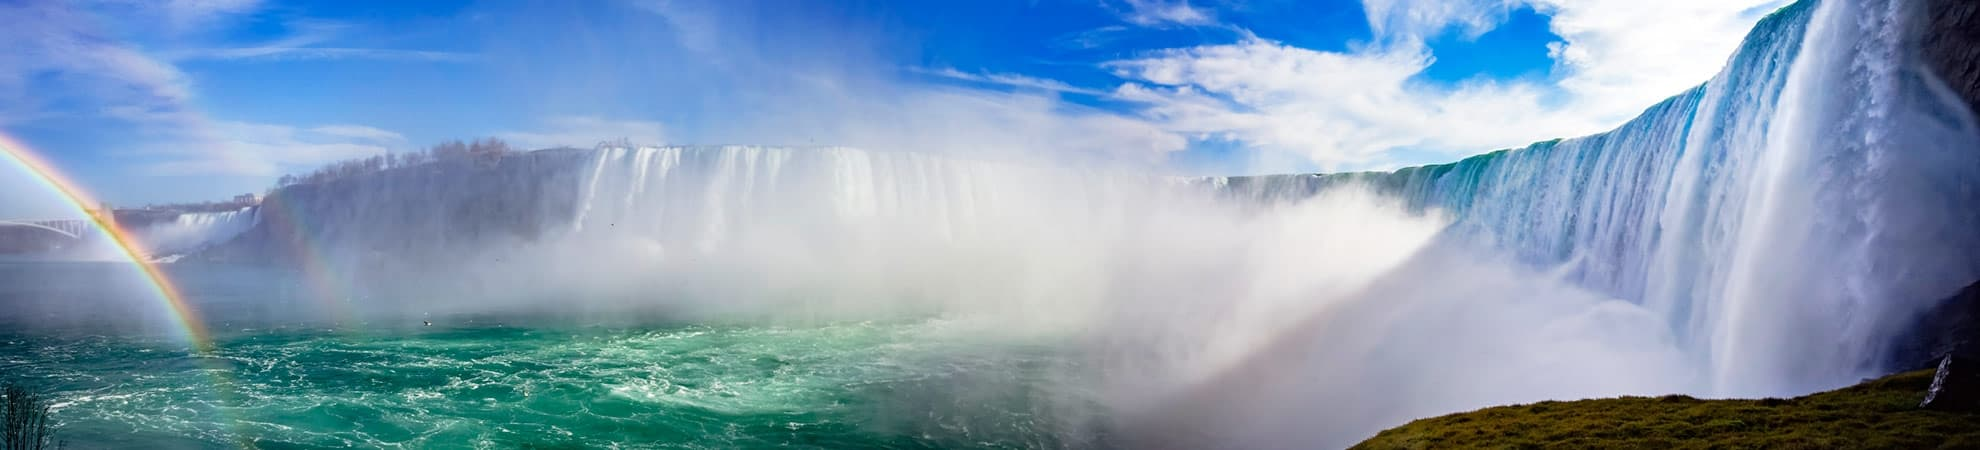 Voyage Niagara Falls